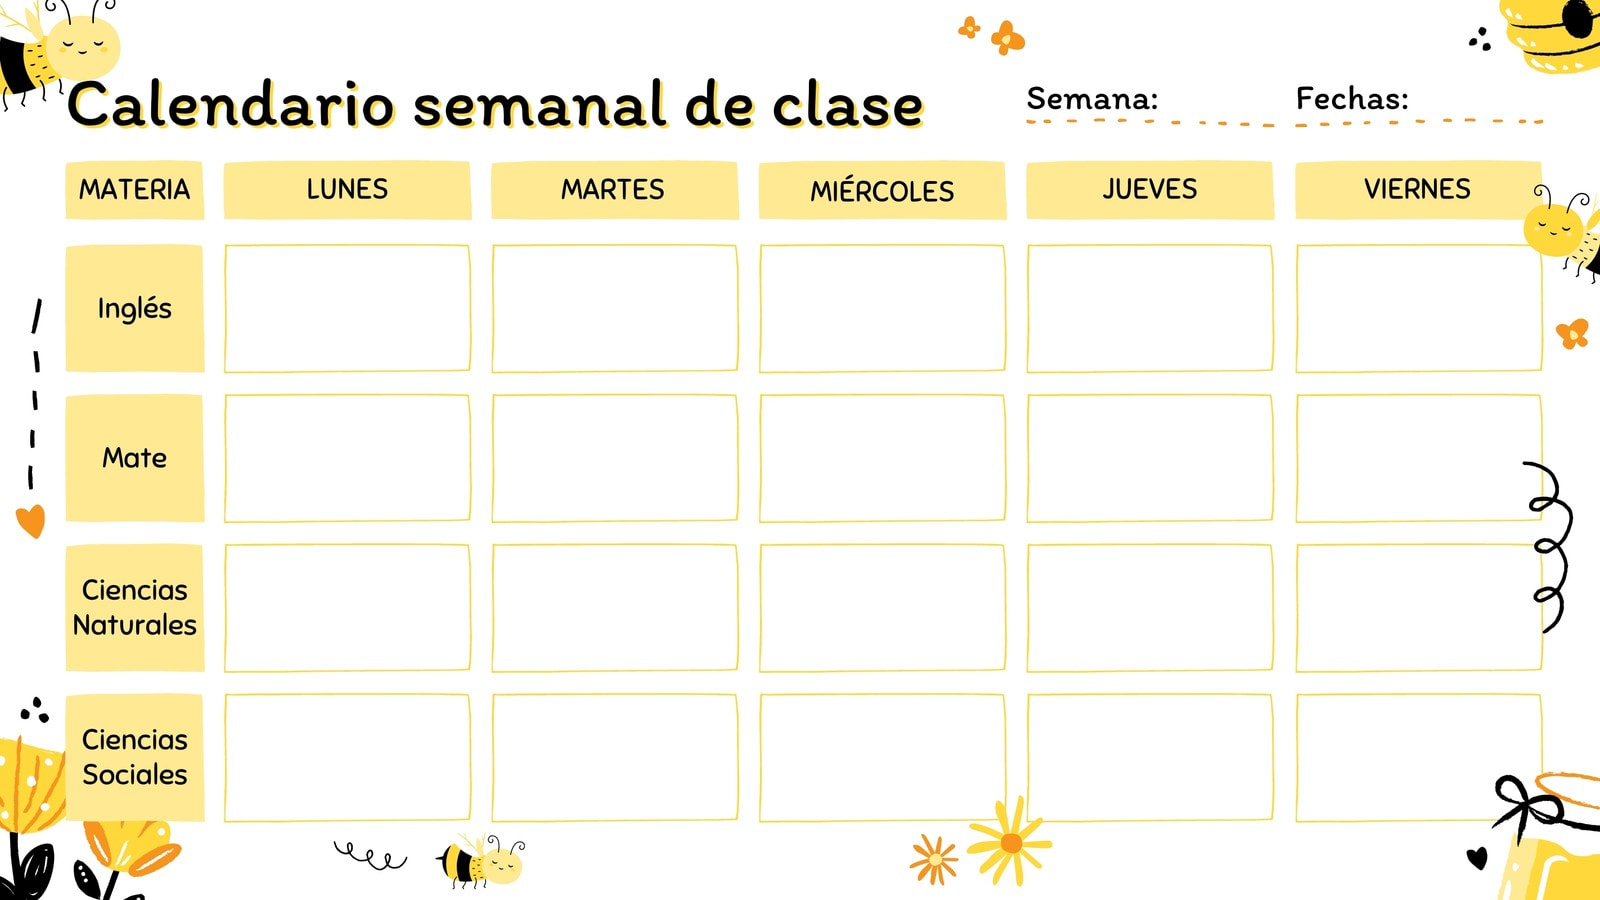 Amarillo Abejas Formato para Imprimir Semanal Calendario para Aula de Clases en Blanco